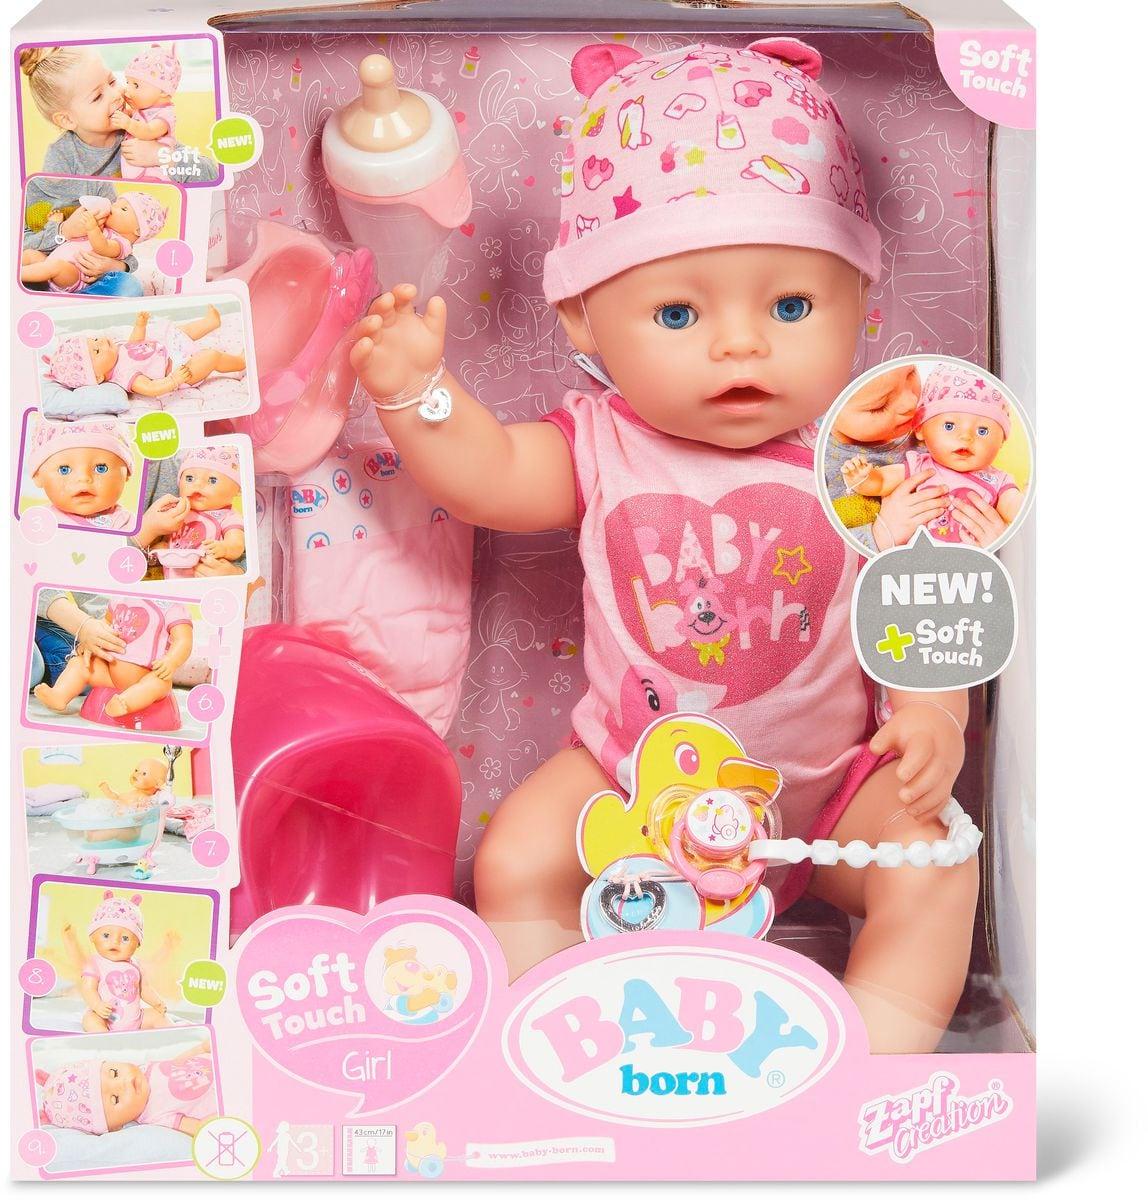 Baby Born Soft Touch Girl, 43cm Poupée